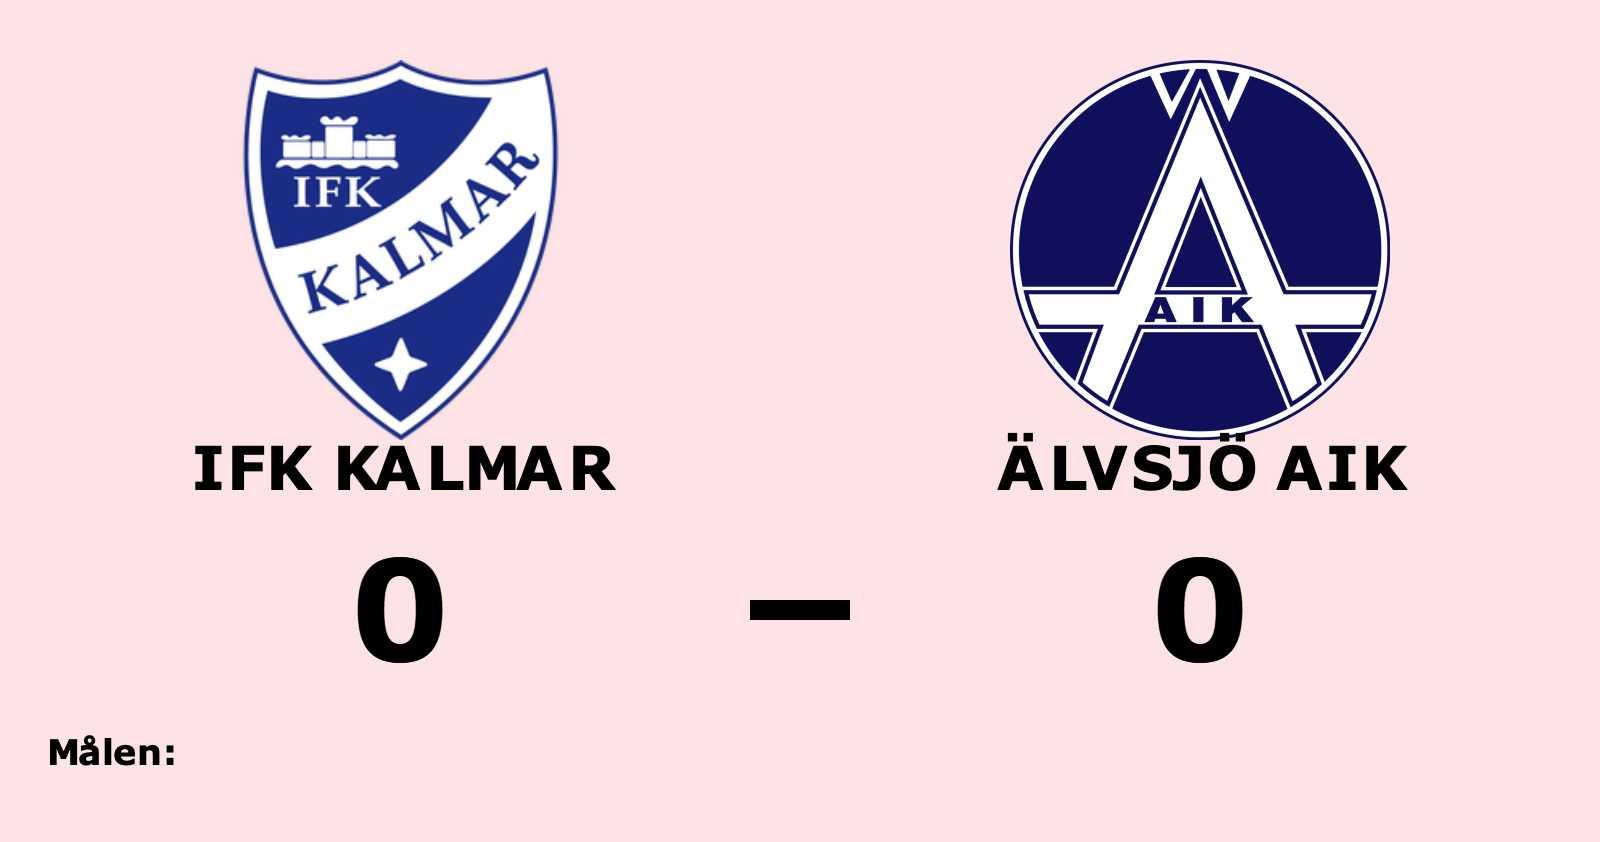 Mållös match när IFK Kalmar mötte Älvsjö AIK